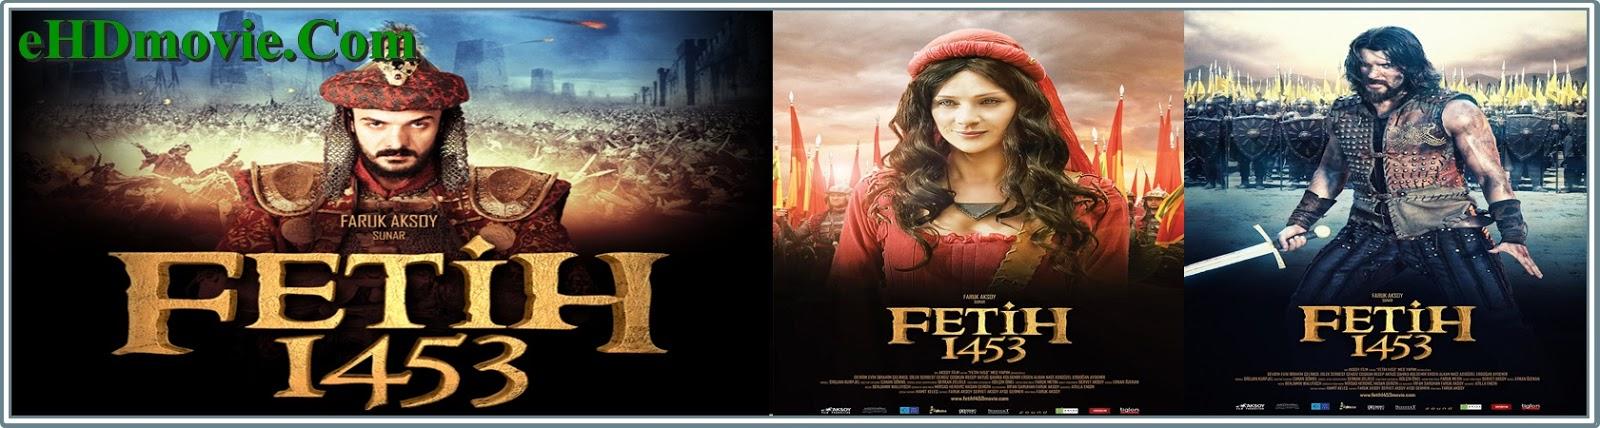 Fetih 1453 2012 Full Movie English 720p - 480p ORG BRRip 550MB - 1.2GB ESubs Free Download